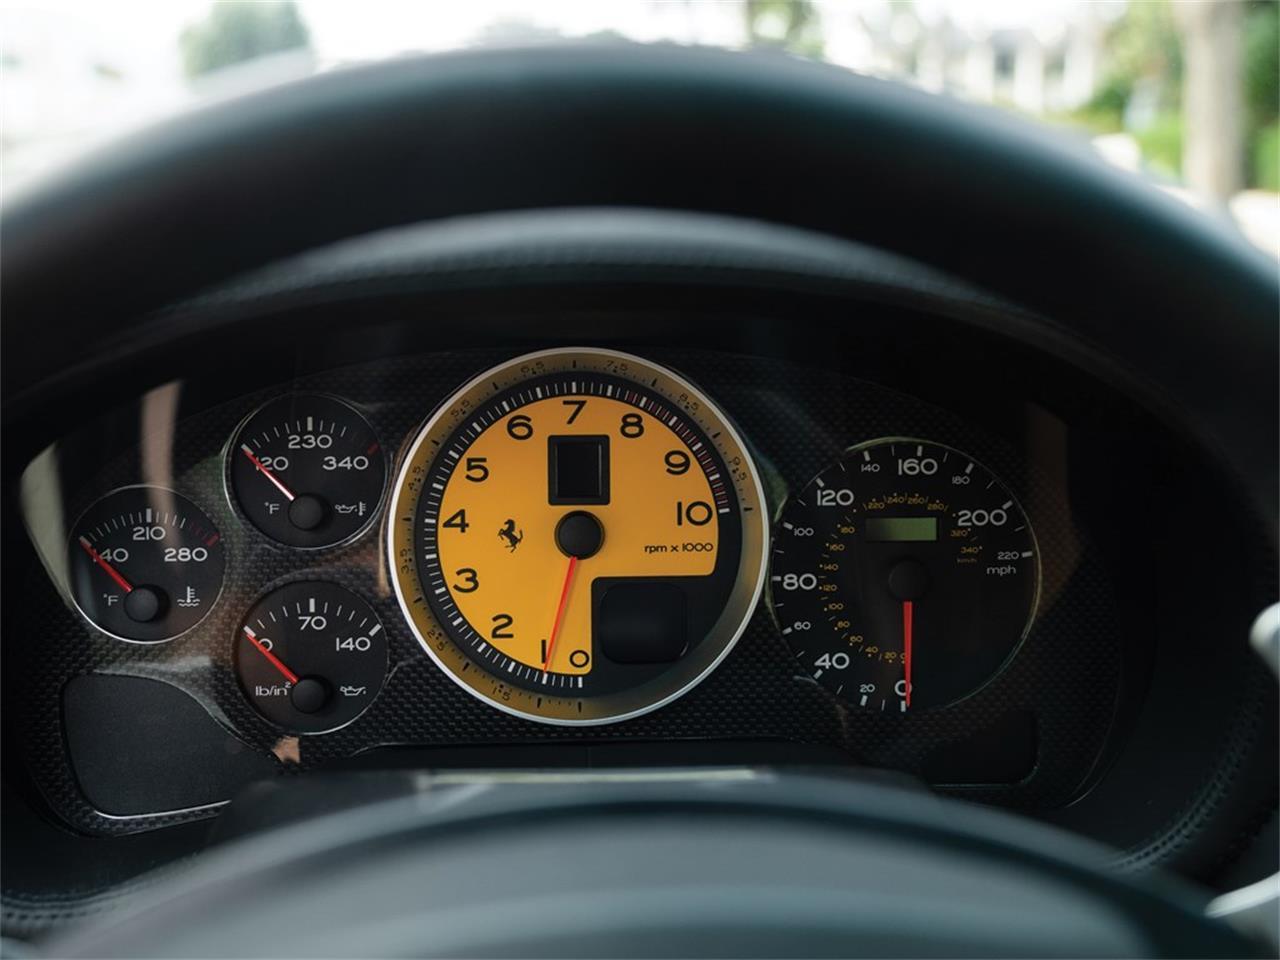 Large Picture of '05 Ferrari Superamerica located in Amelia Island Florida Auction Vehicle - PGXH